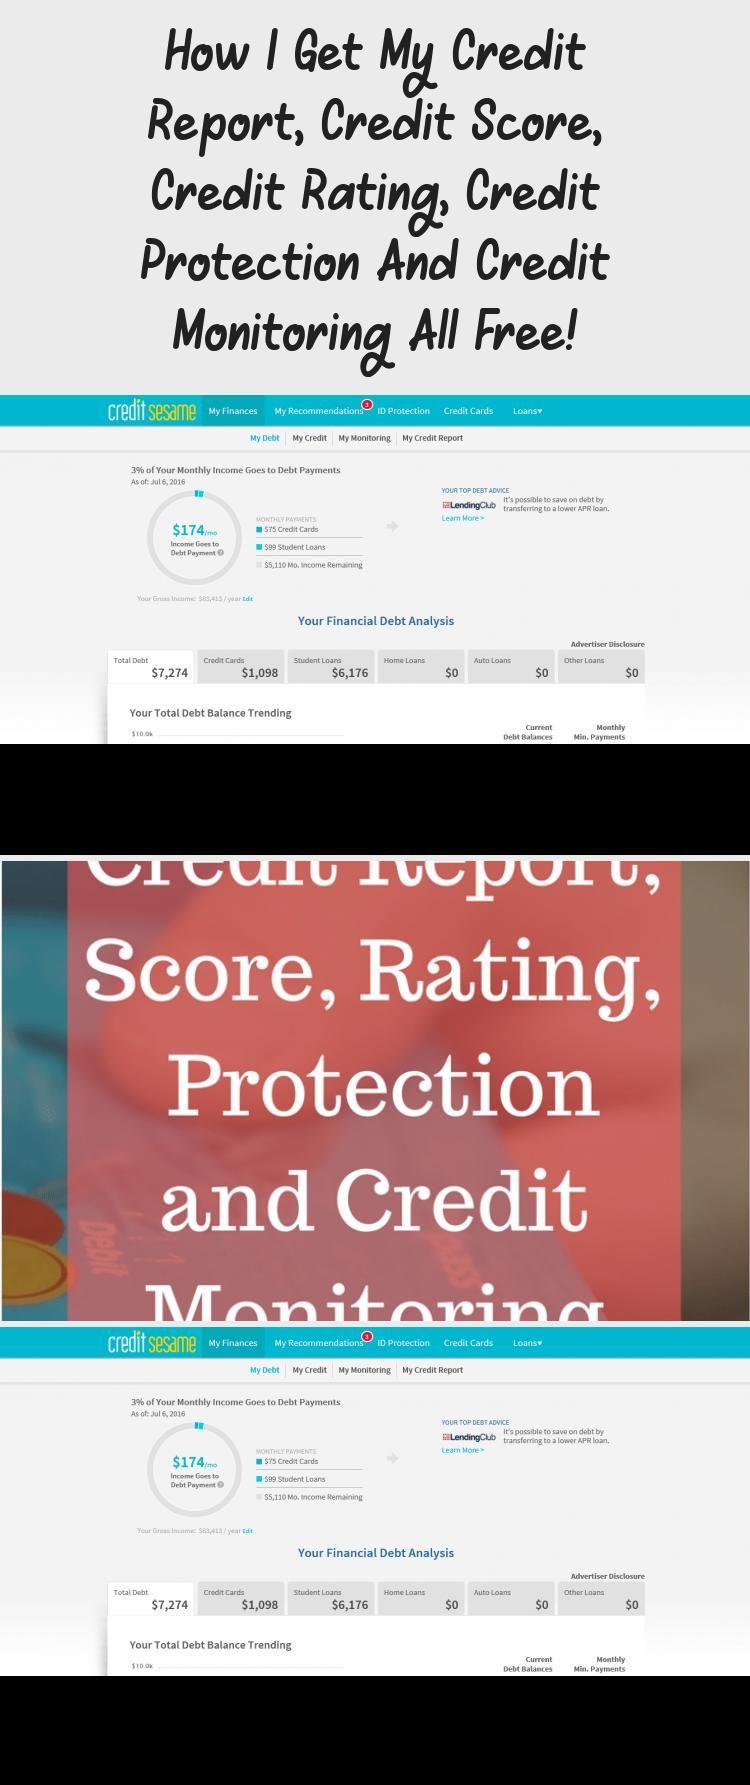 How I Get My Credit Report Credit Score Credit Rating Credit